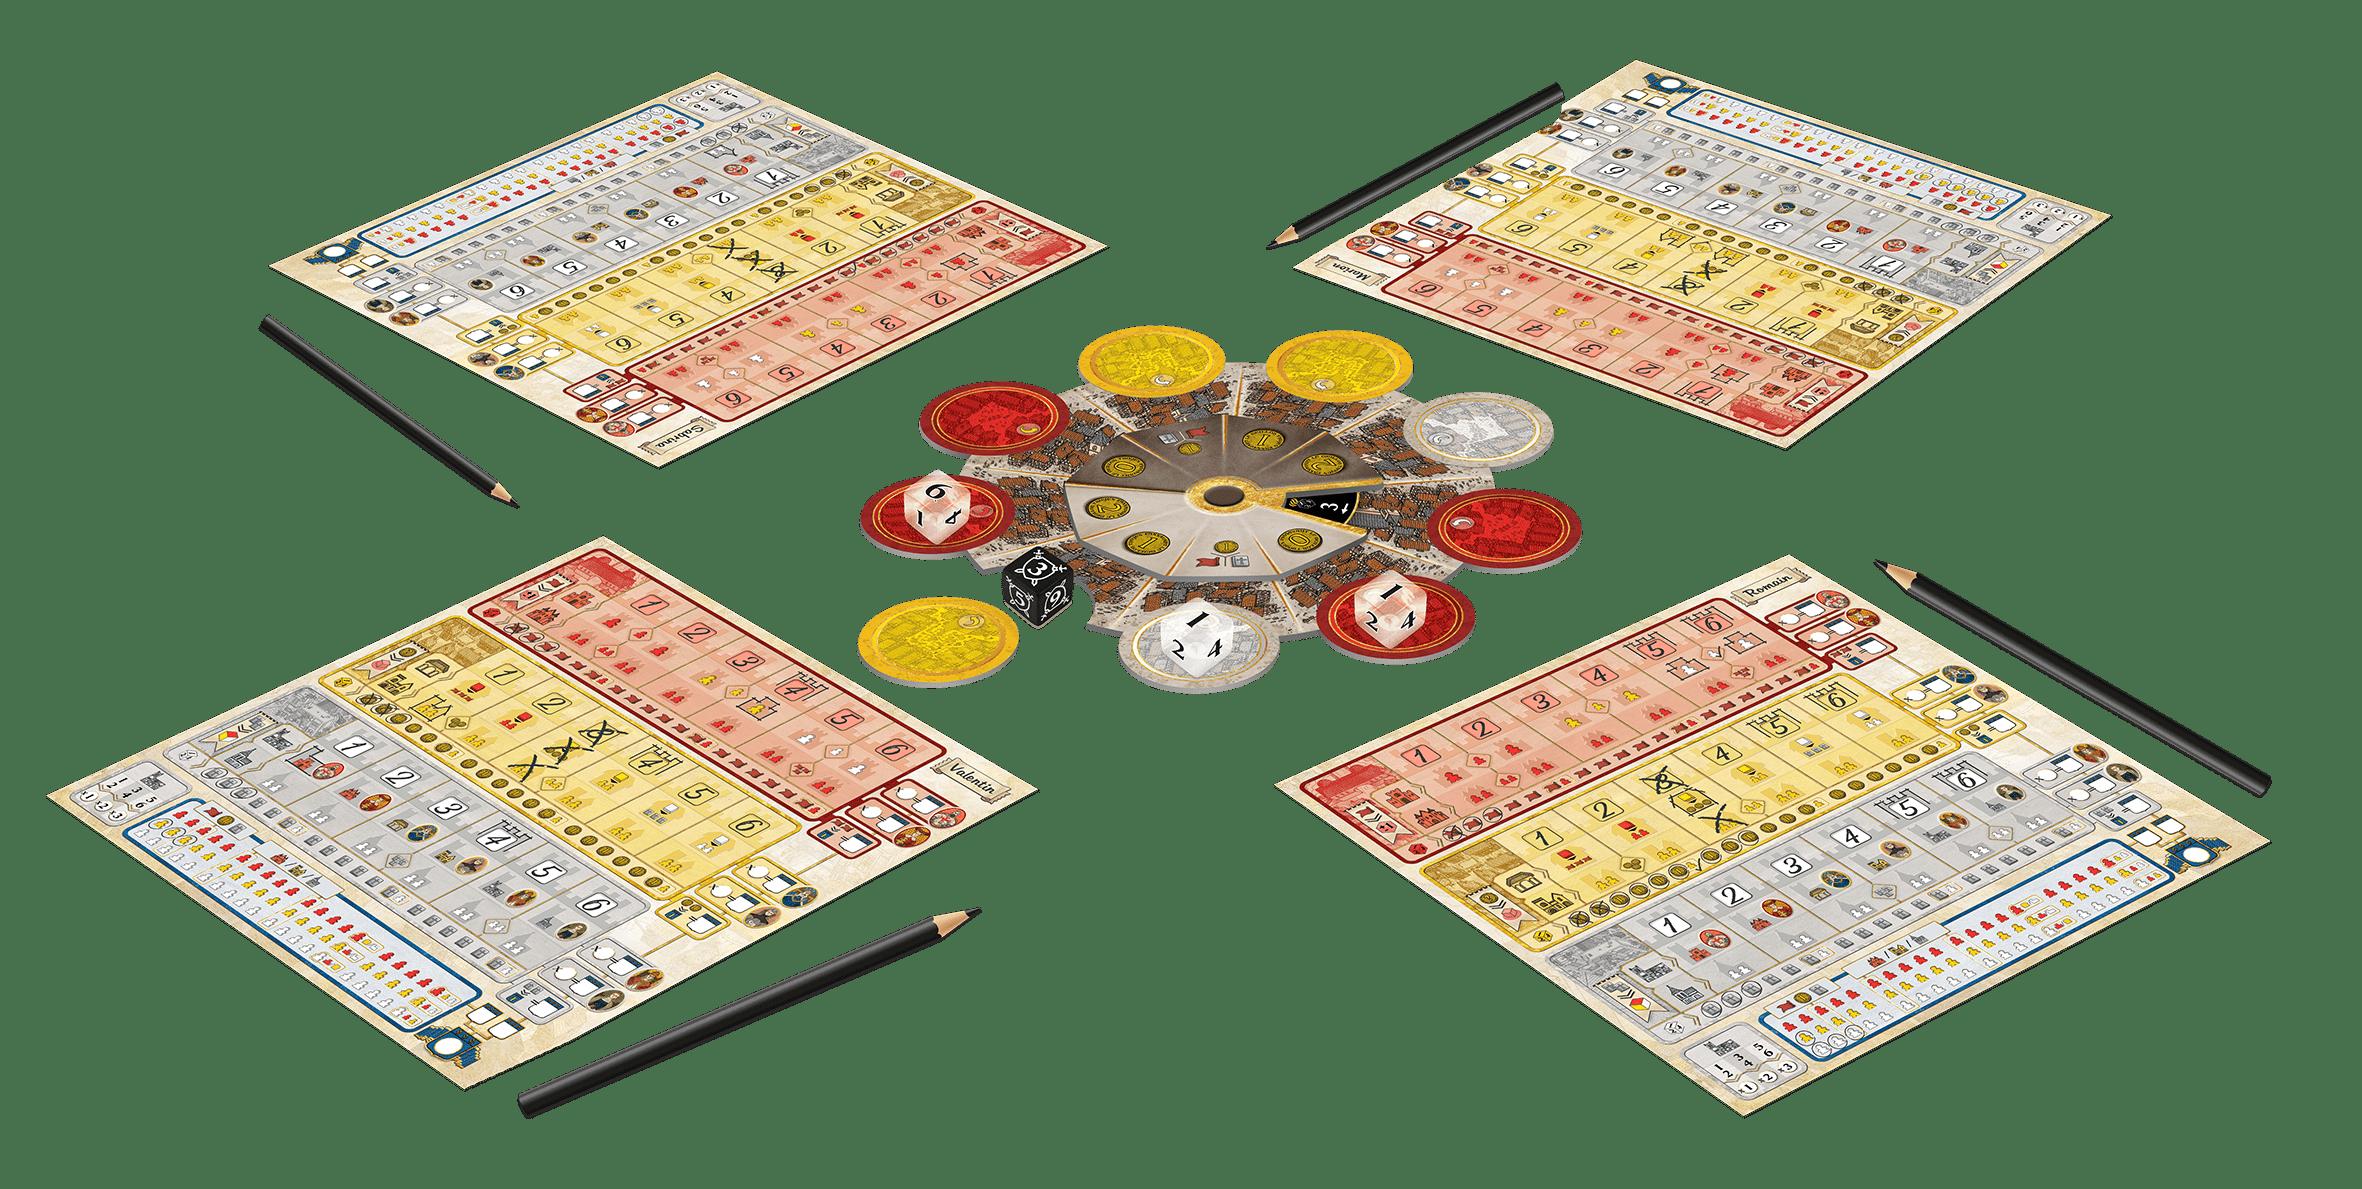 Troyes Dice partie 4 joueurs